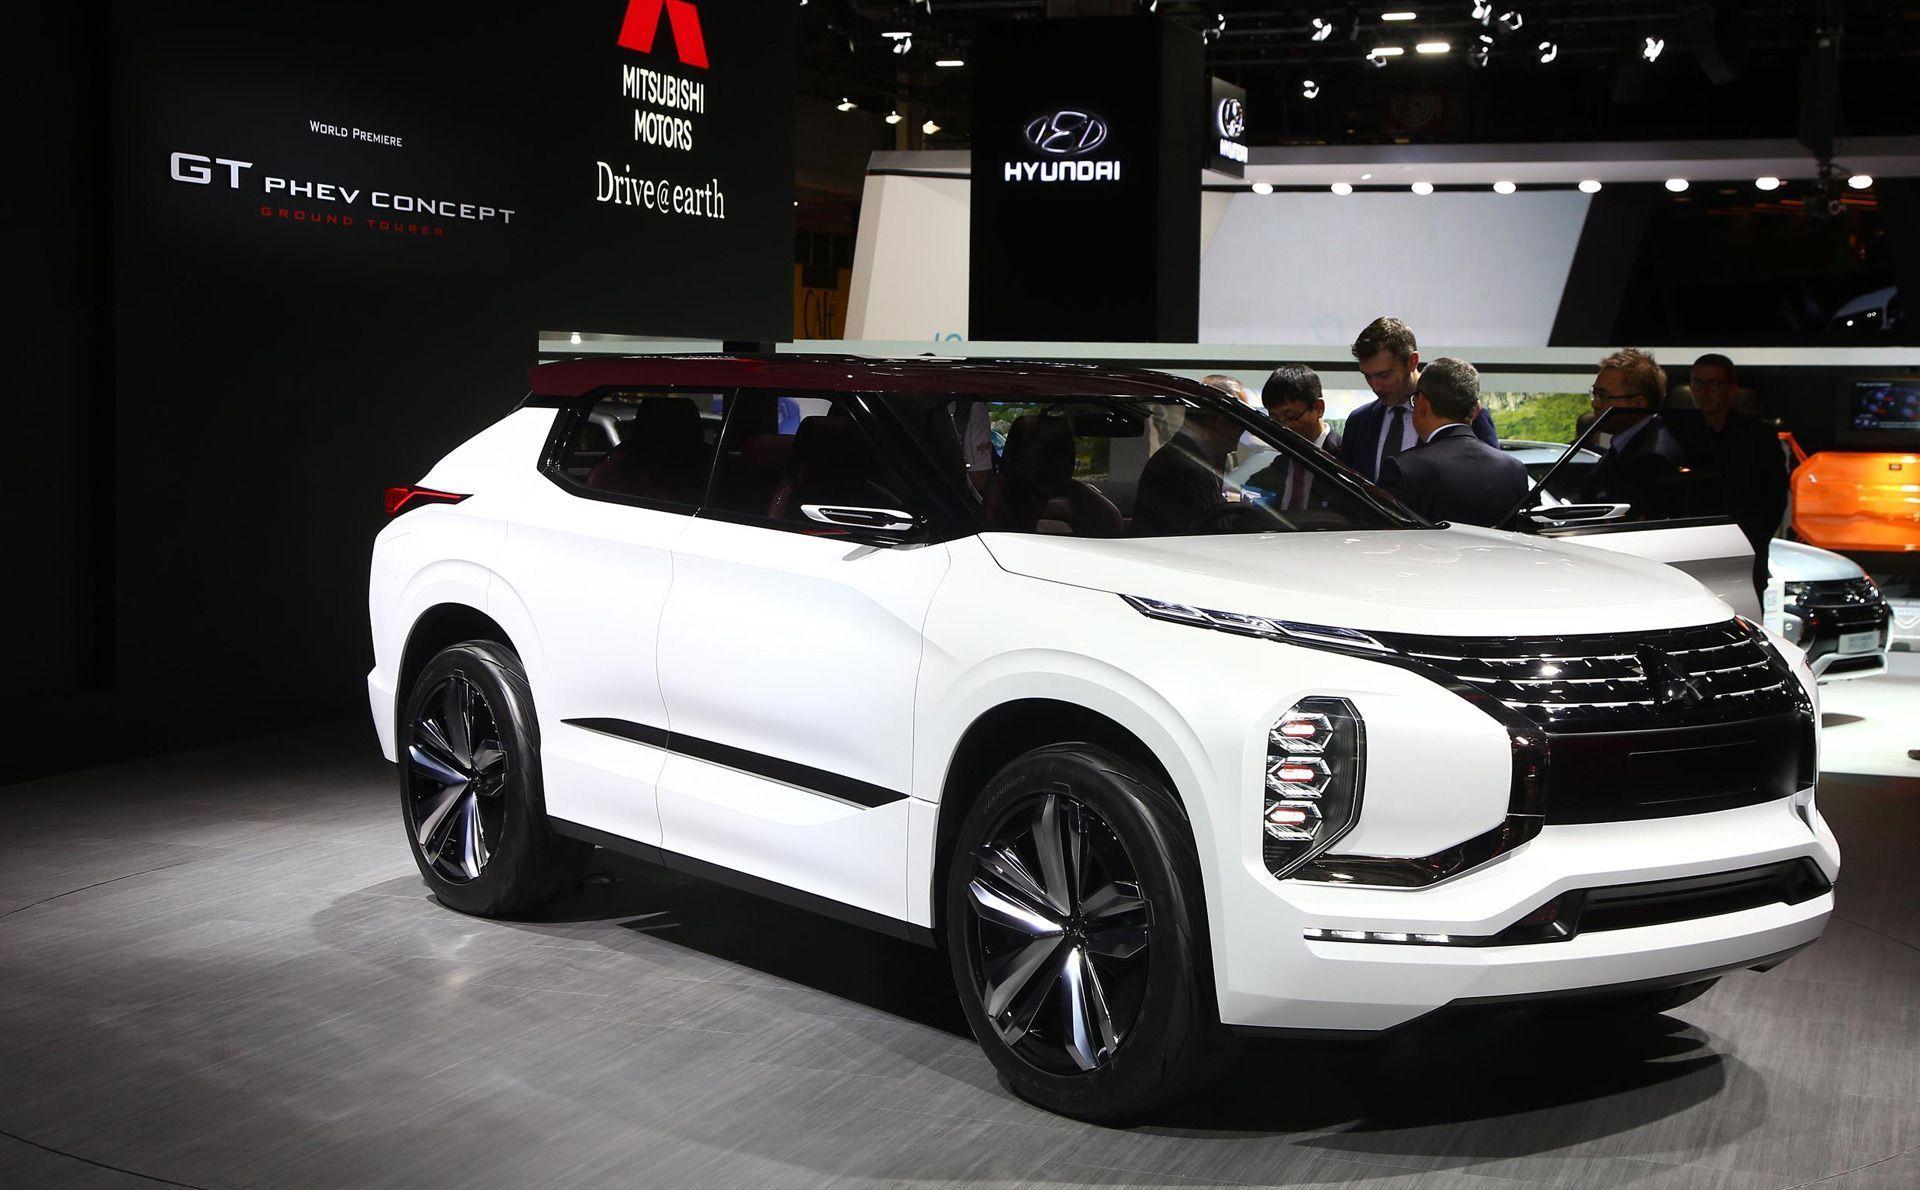 2020 Mitsubishi Pajero Price and Release date